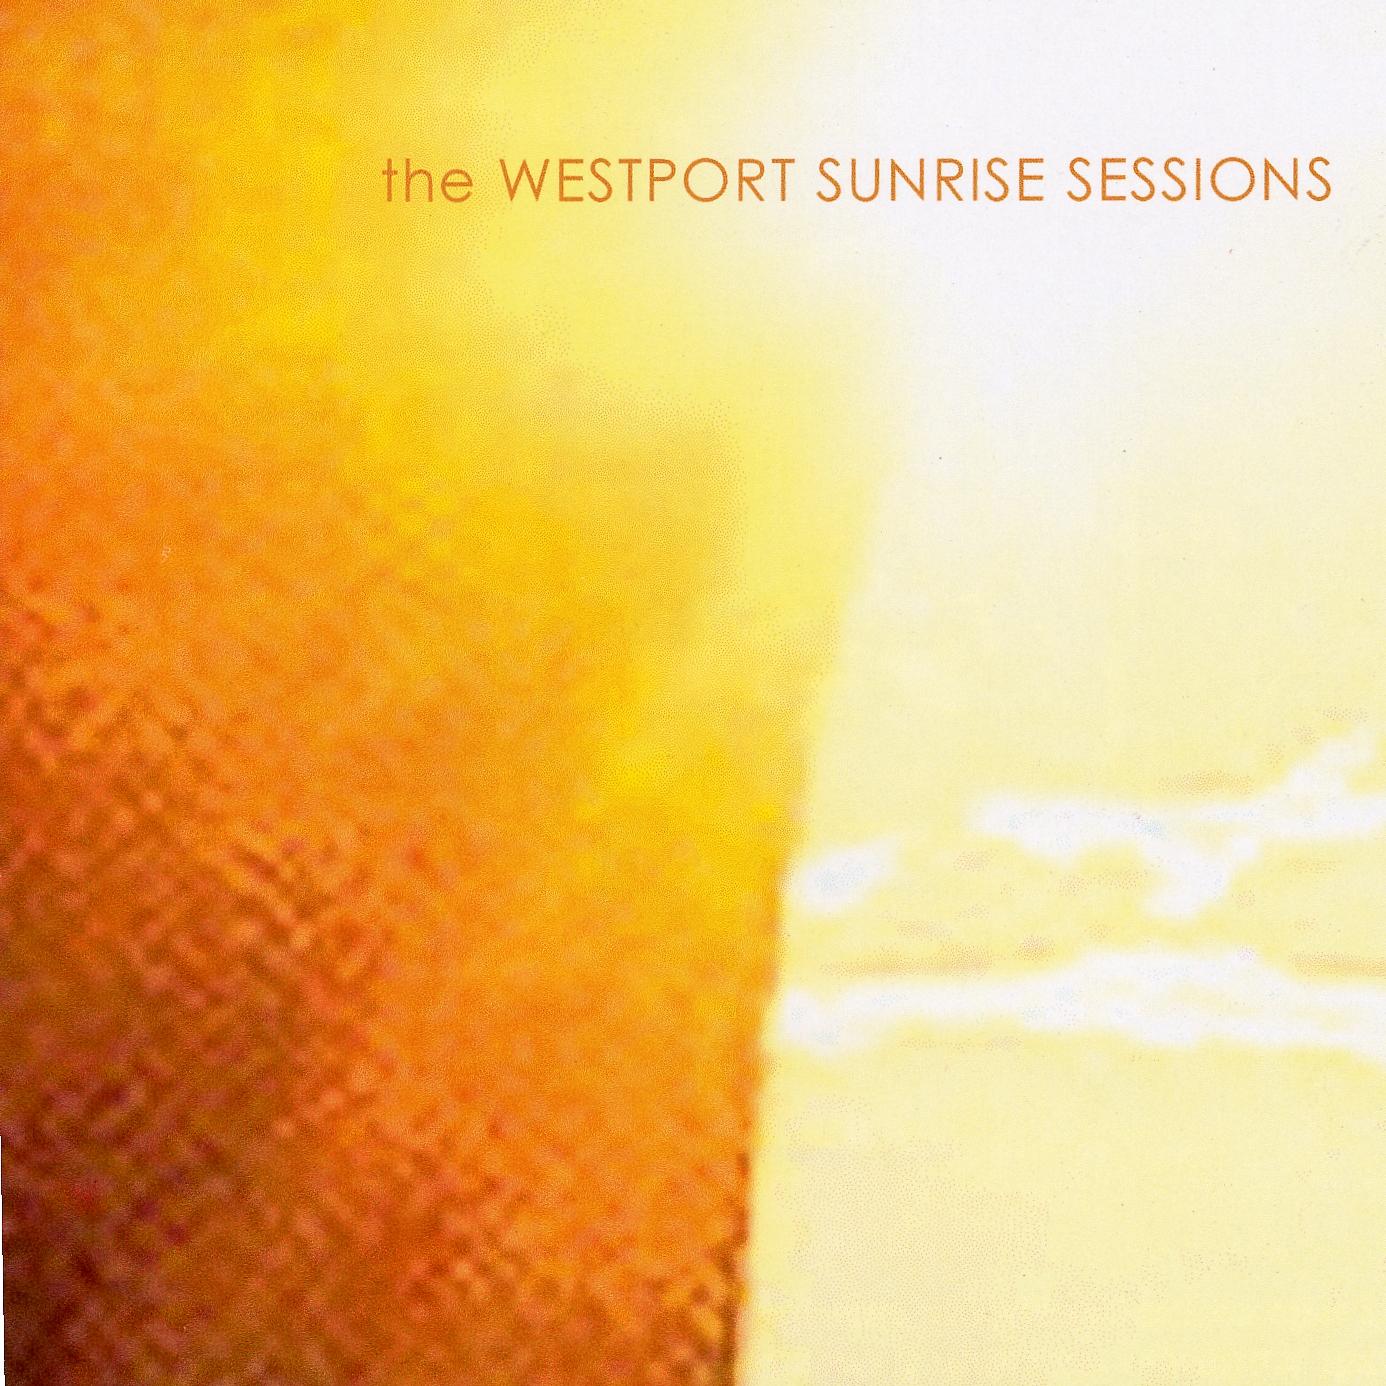 THE WESTPORT SUNRISE SESSIONS